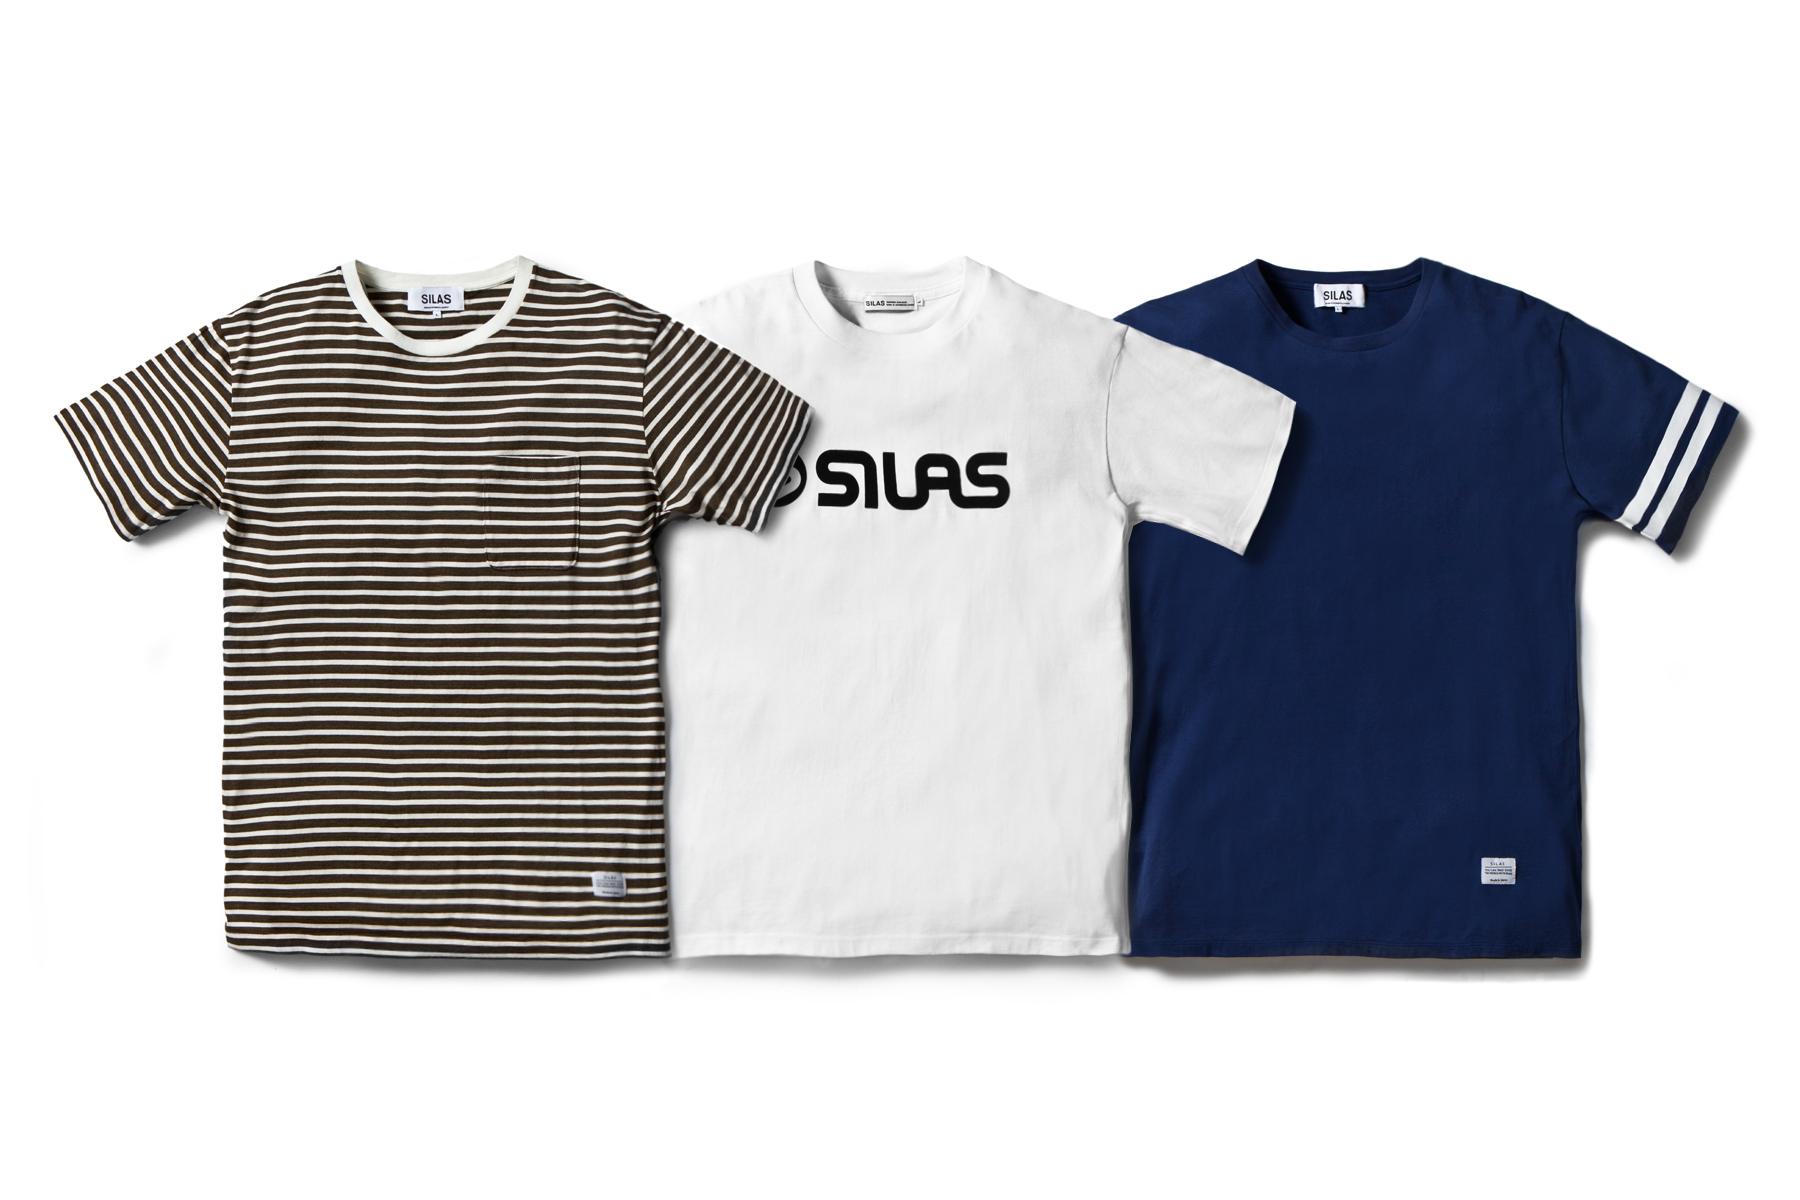 Silas 2015 Summer Collection